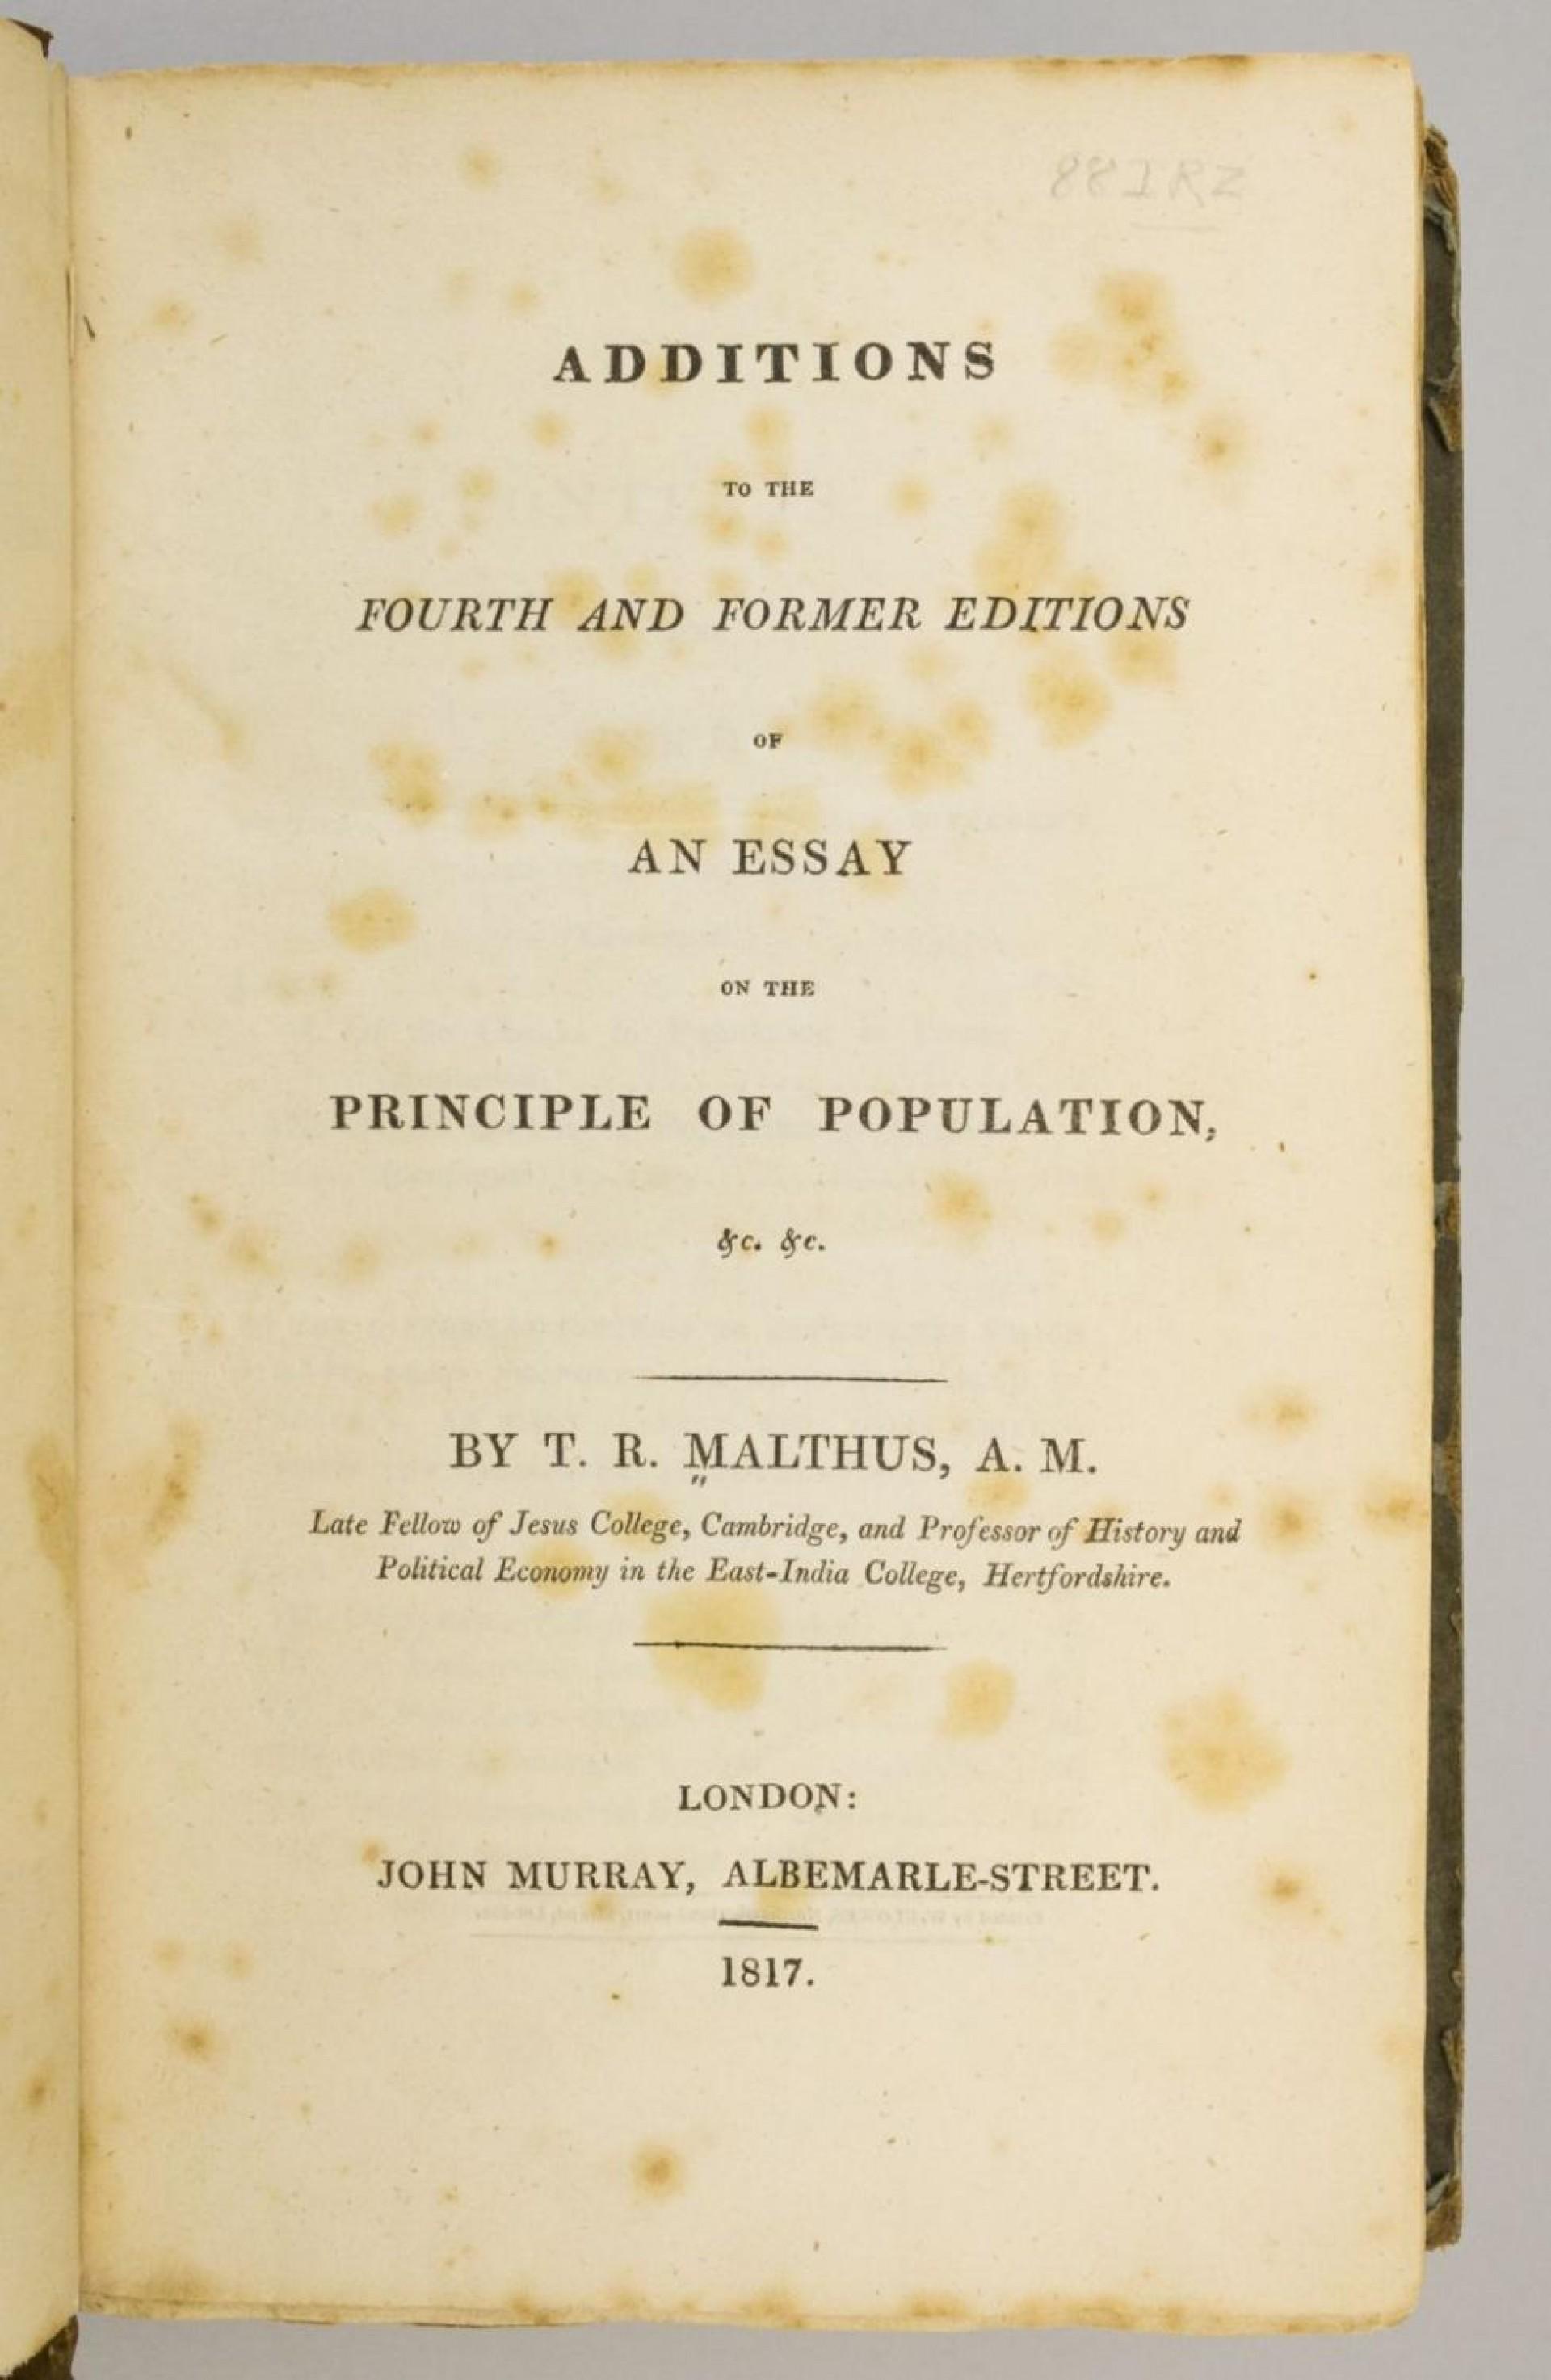 002 Essay Example On The Principle Of Population 5337830061 2 Singular Pdf By Thomas Malthus Main Idea 1920